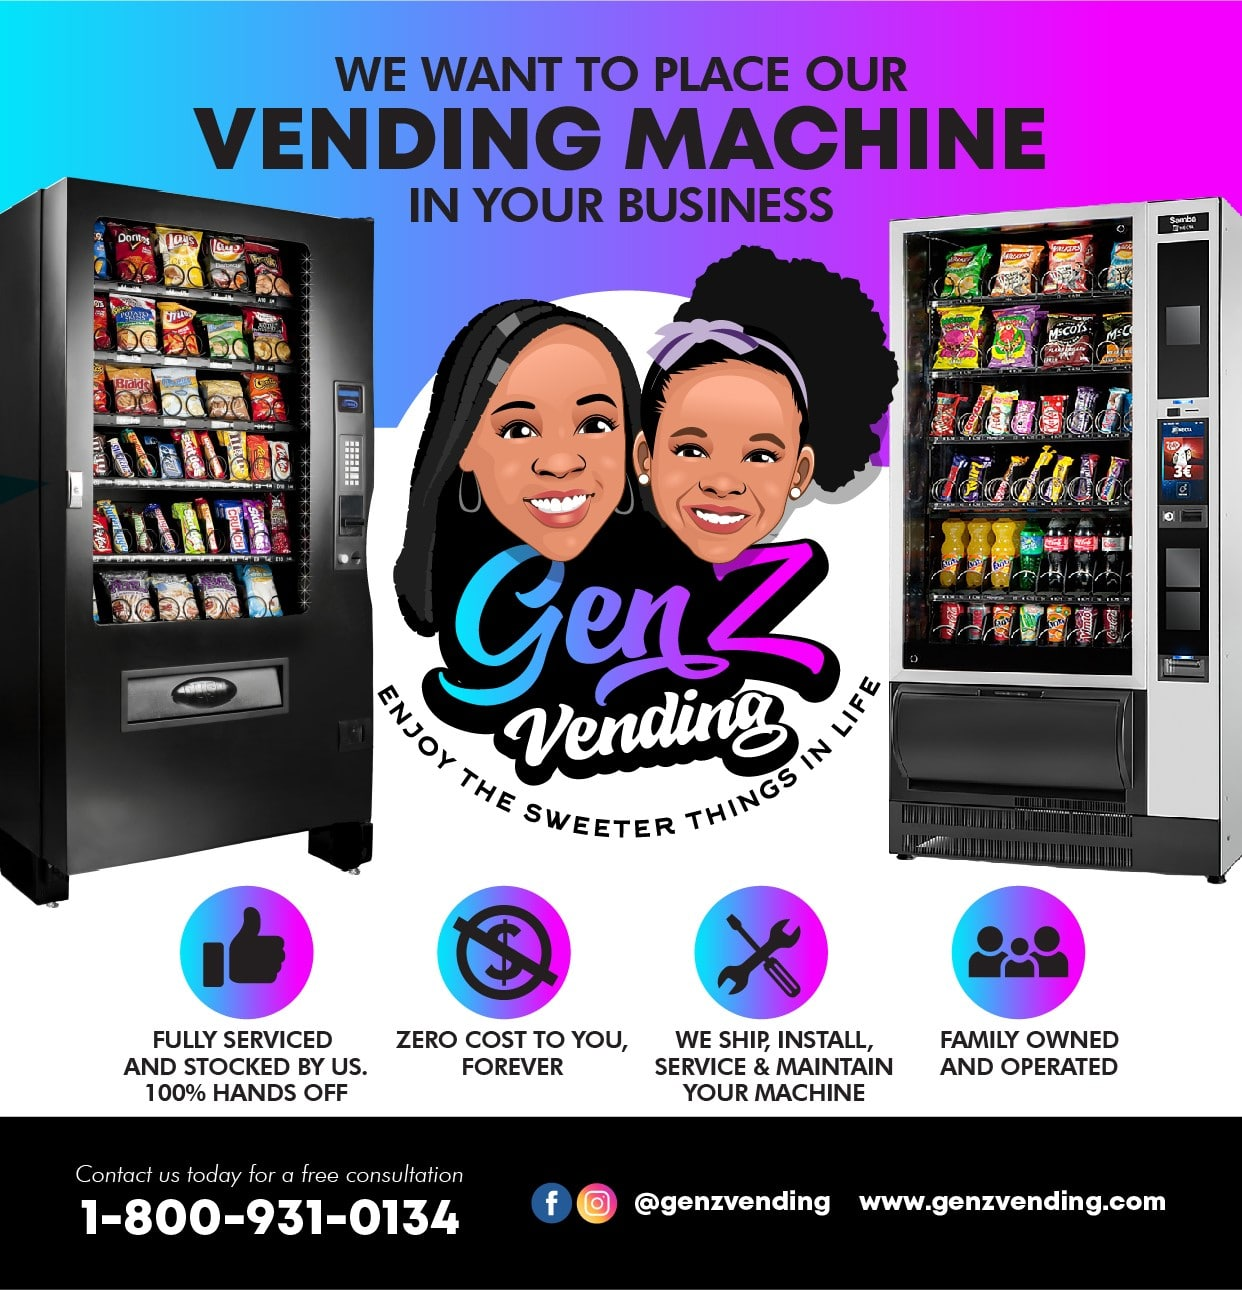 GenZ Vending